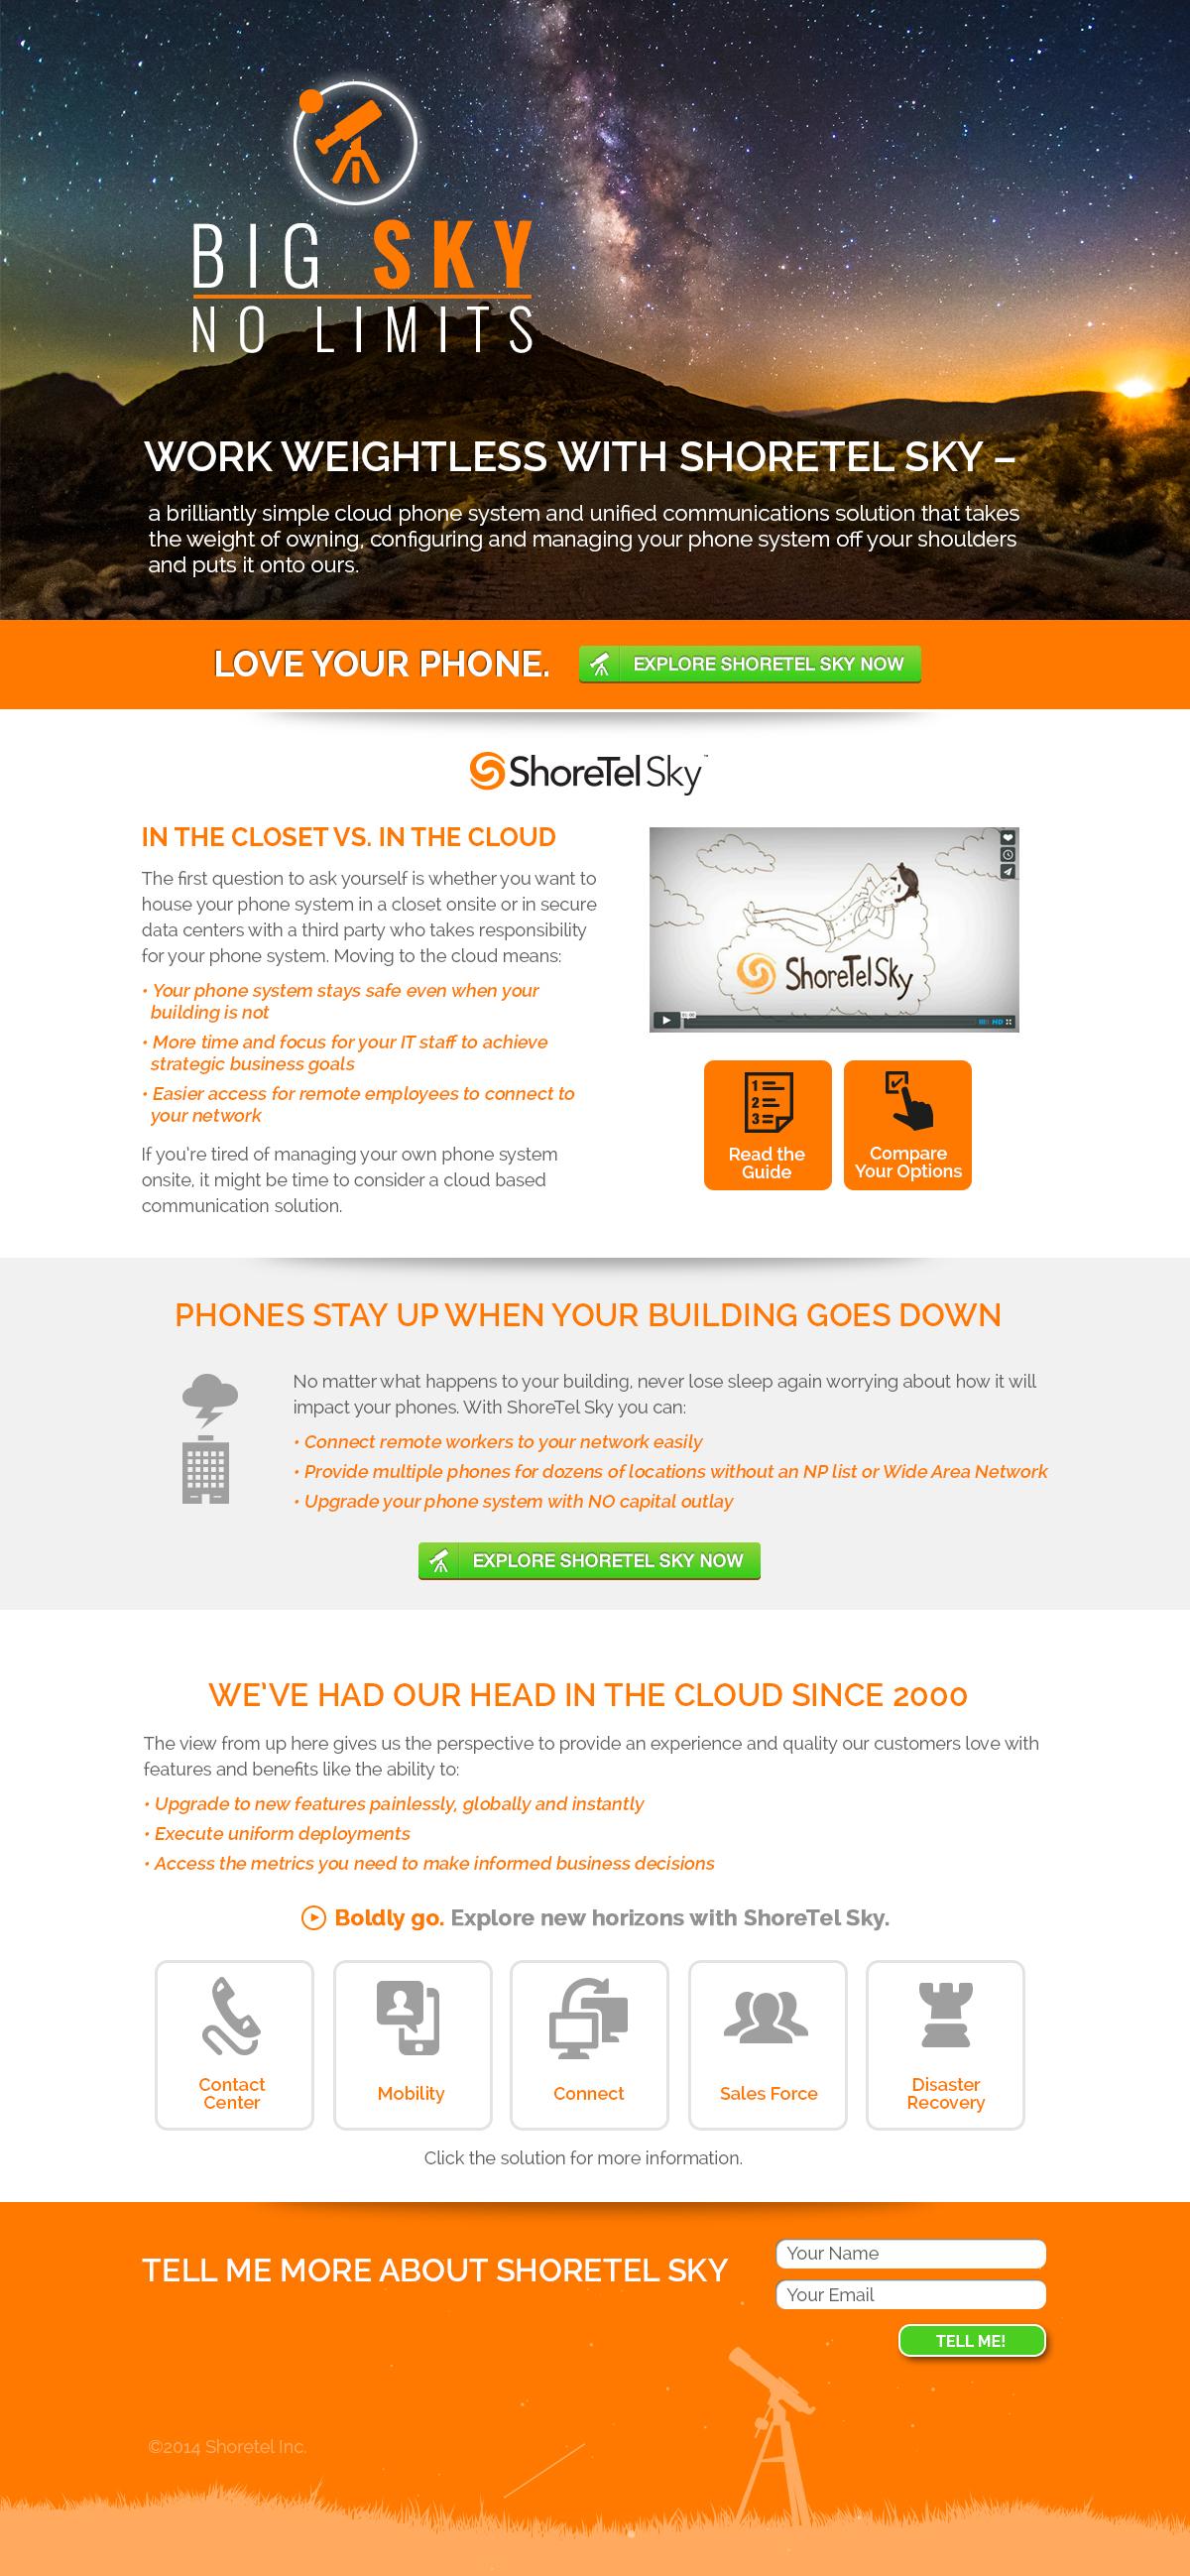 BigSky-LandingPage - ShoreTel Sky Campaign Copy Example